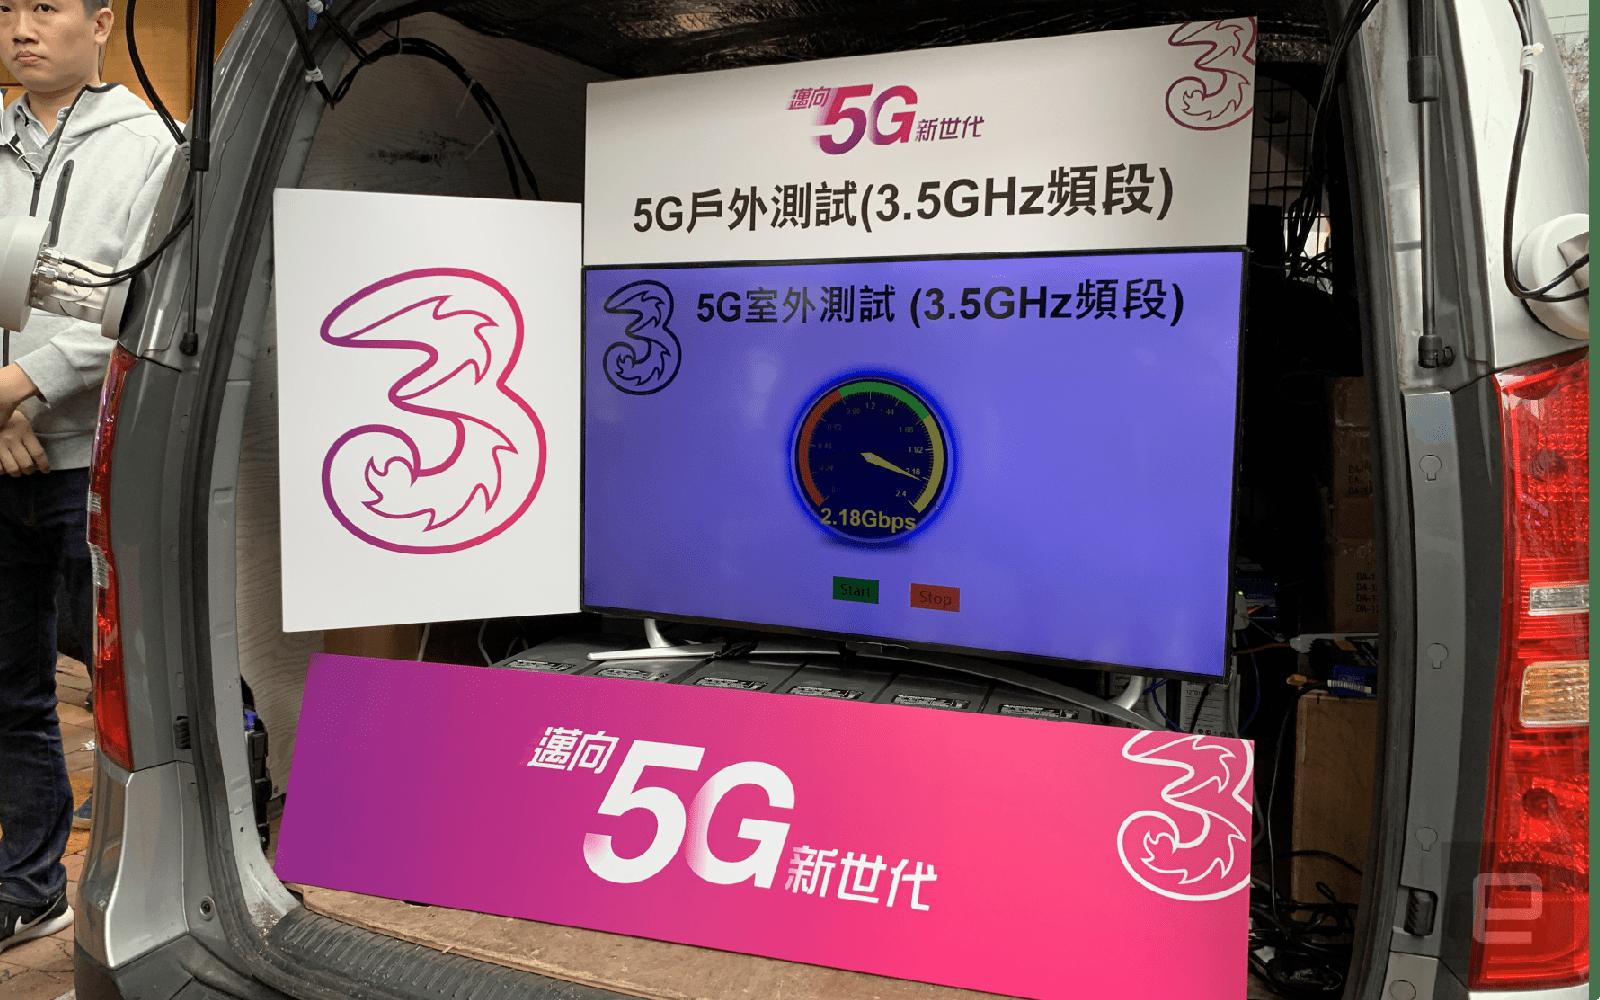 3HK 5G demo